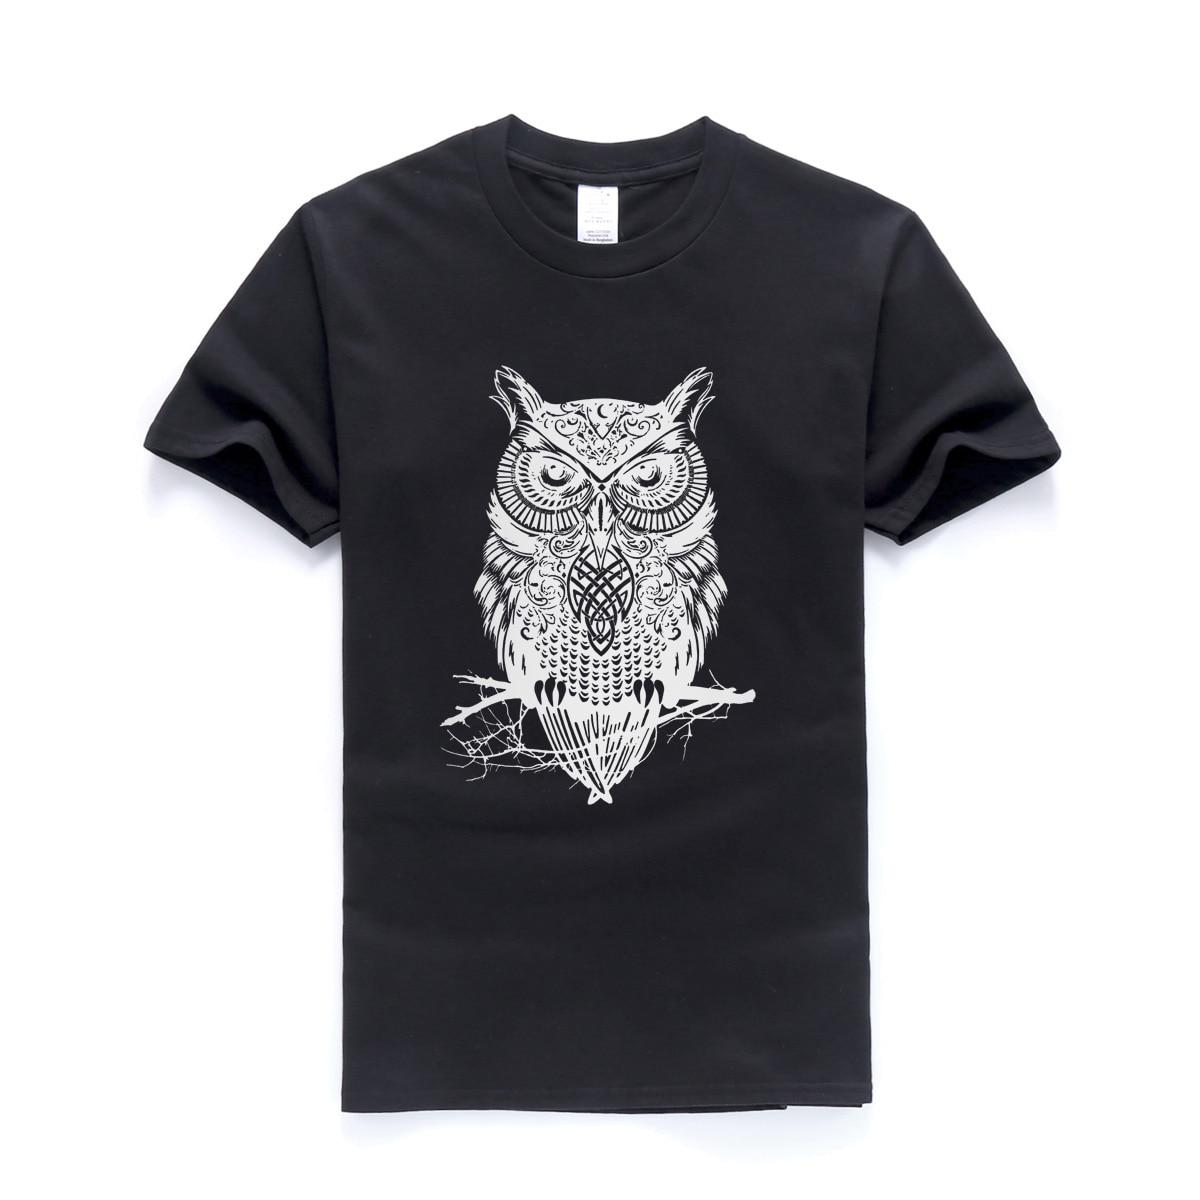 animal t shirt 2018 summer 100% cotton short sleeve t-shirt owl printed tops tees men funny t-shirt casual tshirt brand-clothing